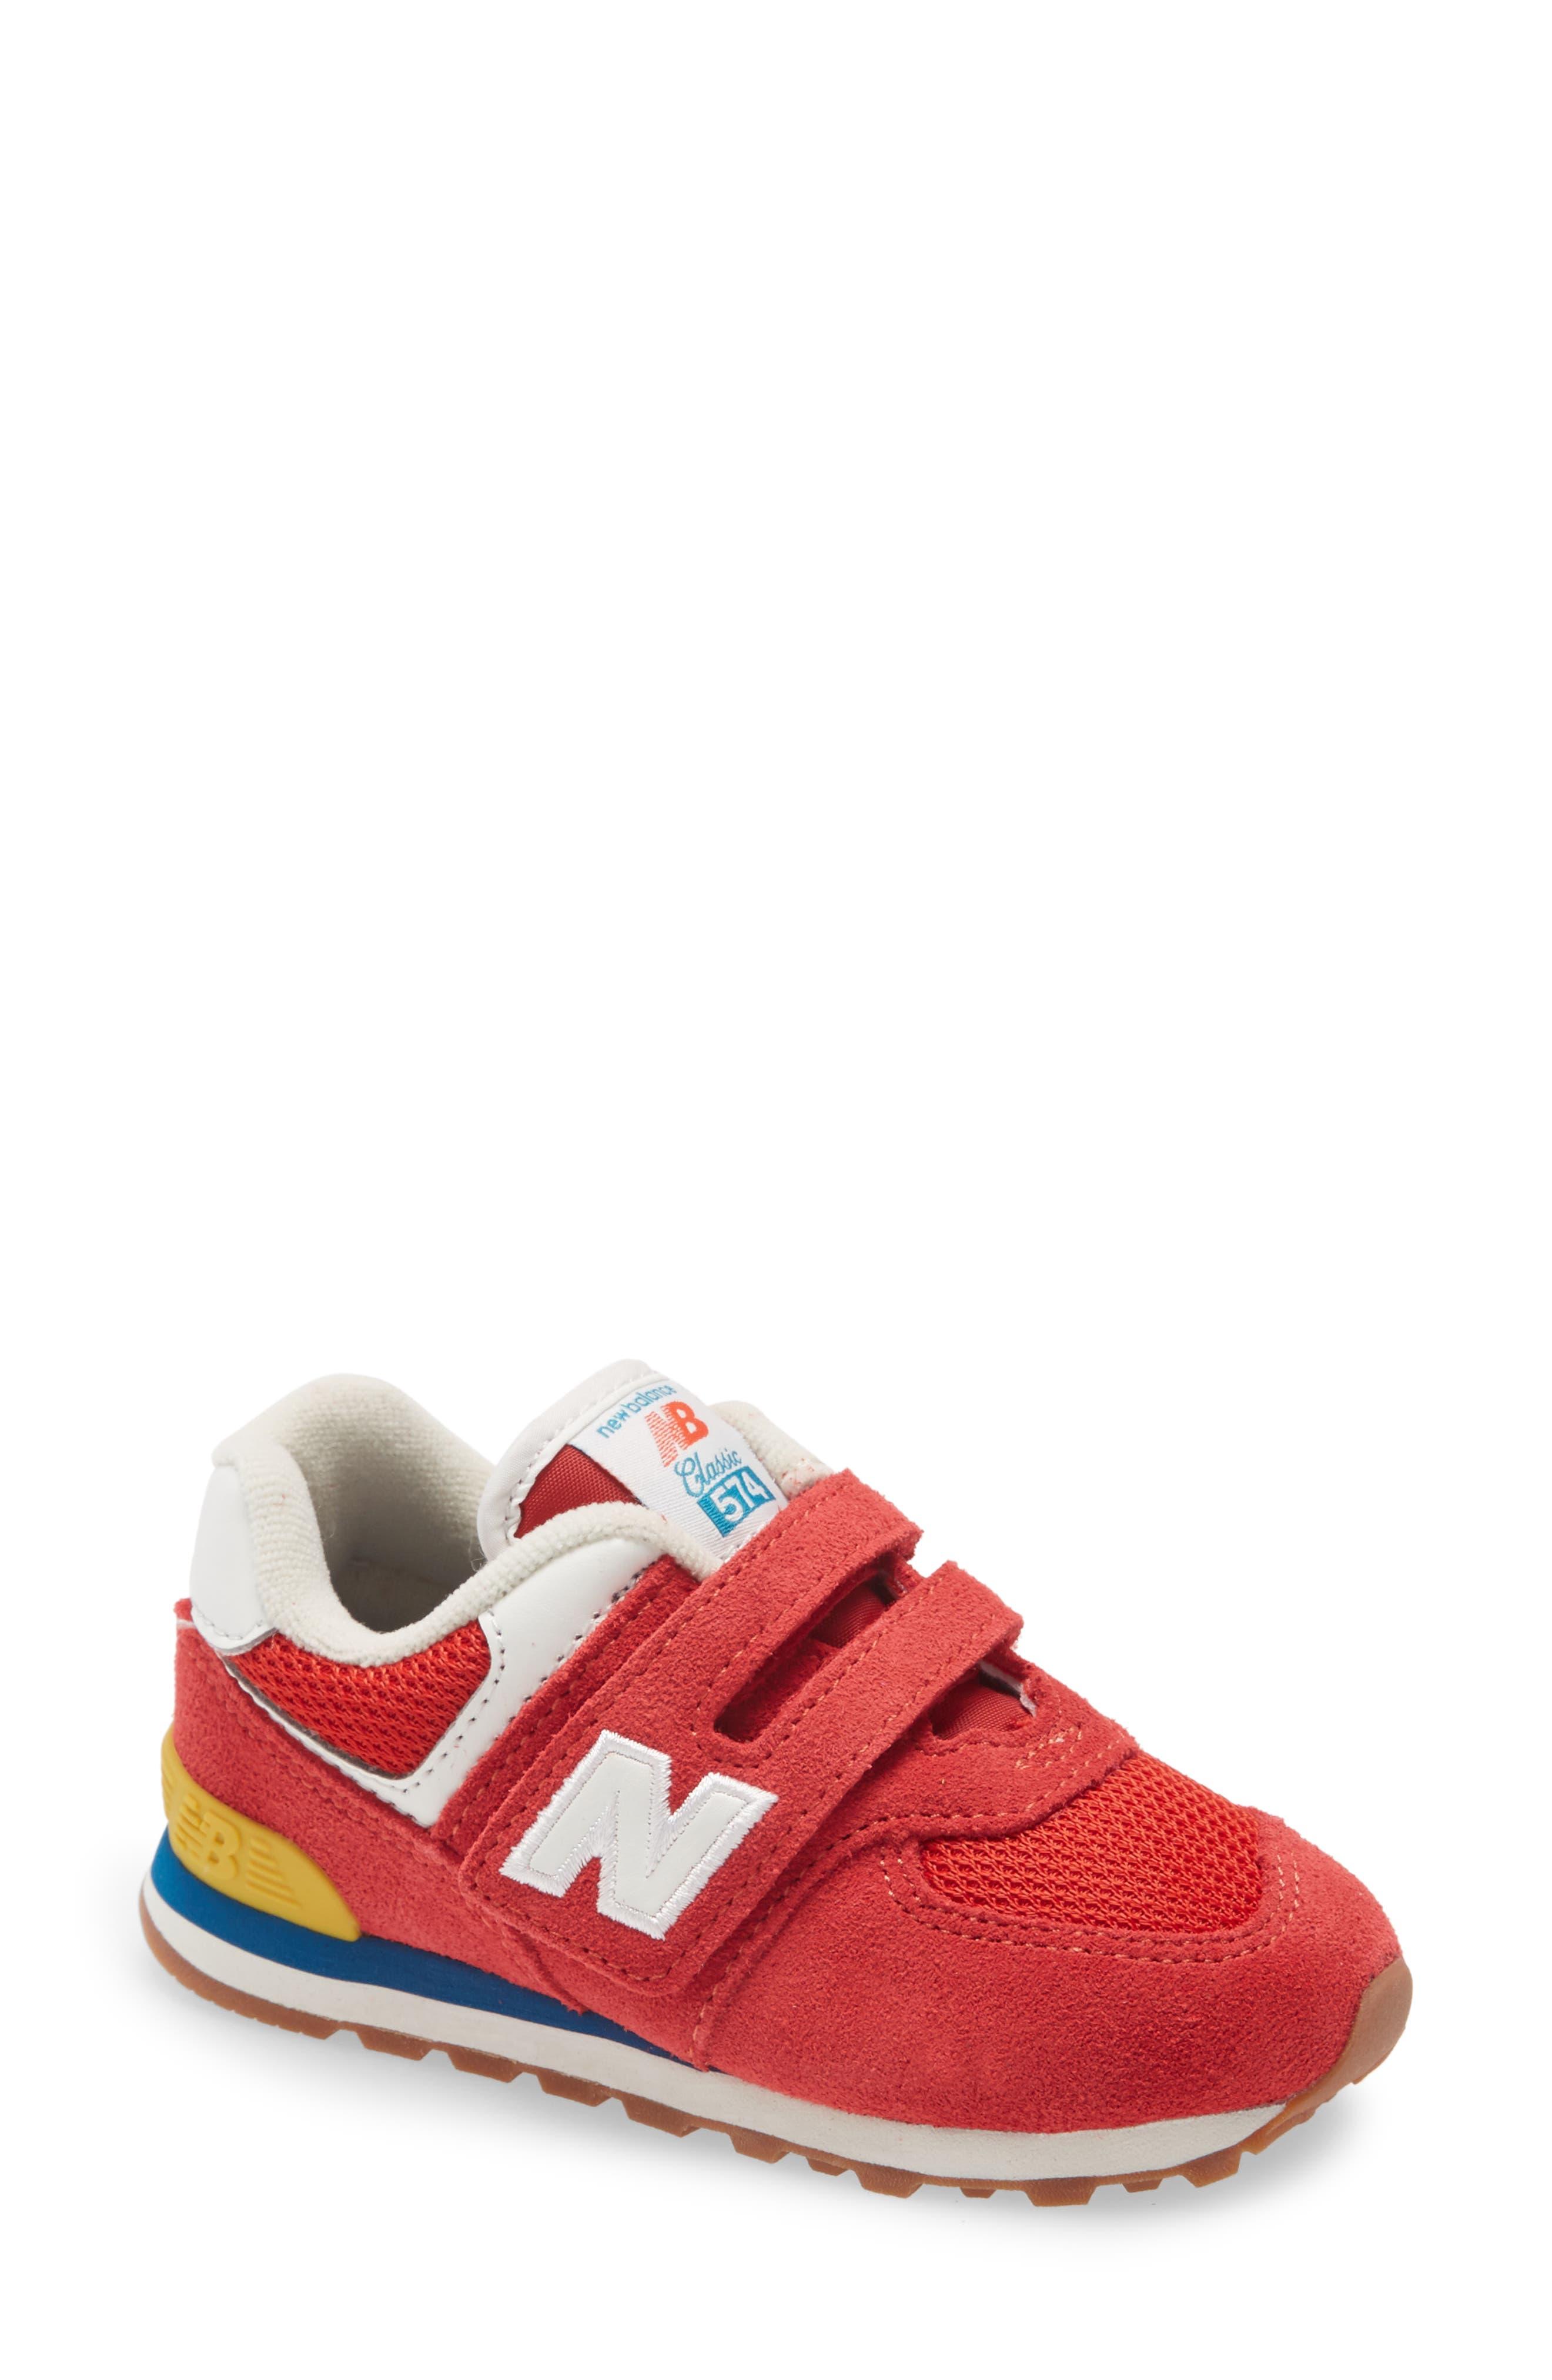 red new balance kids